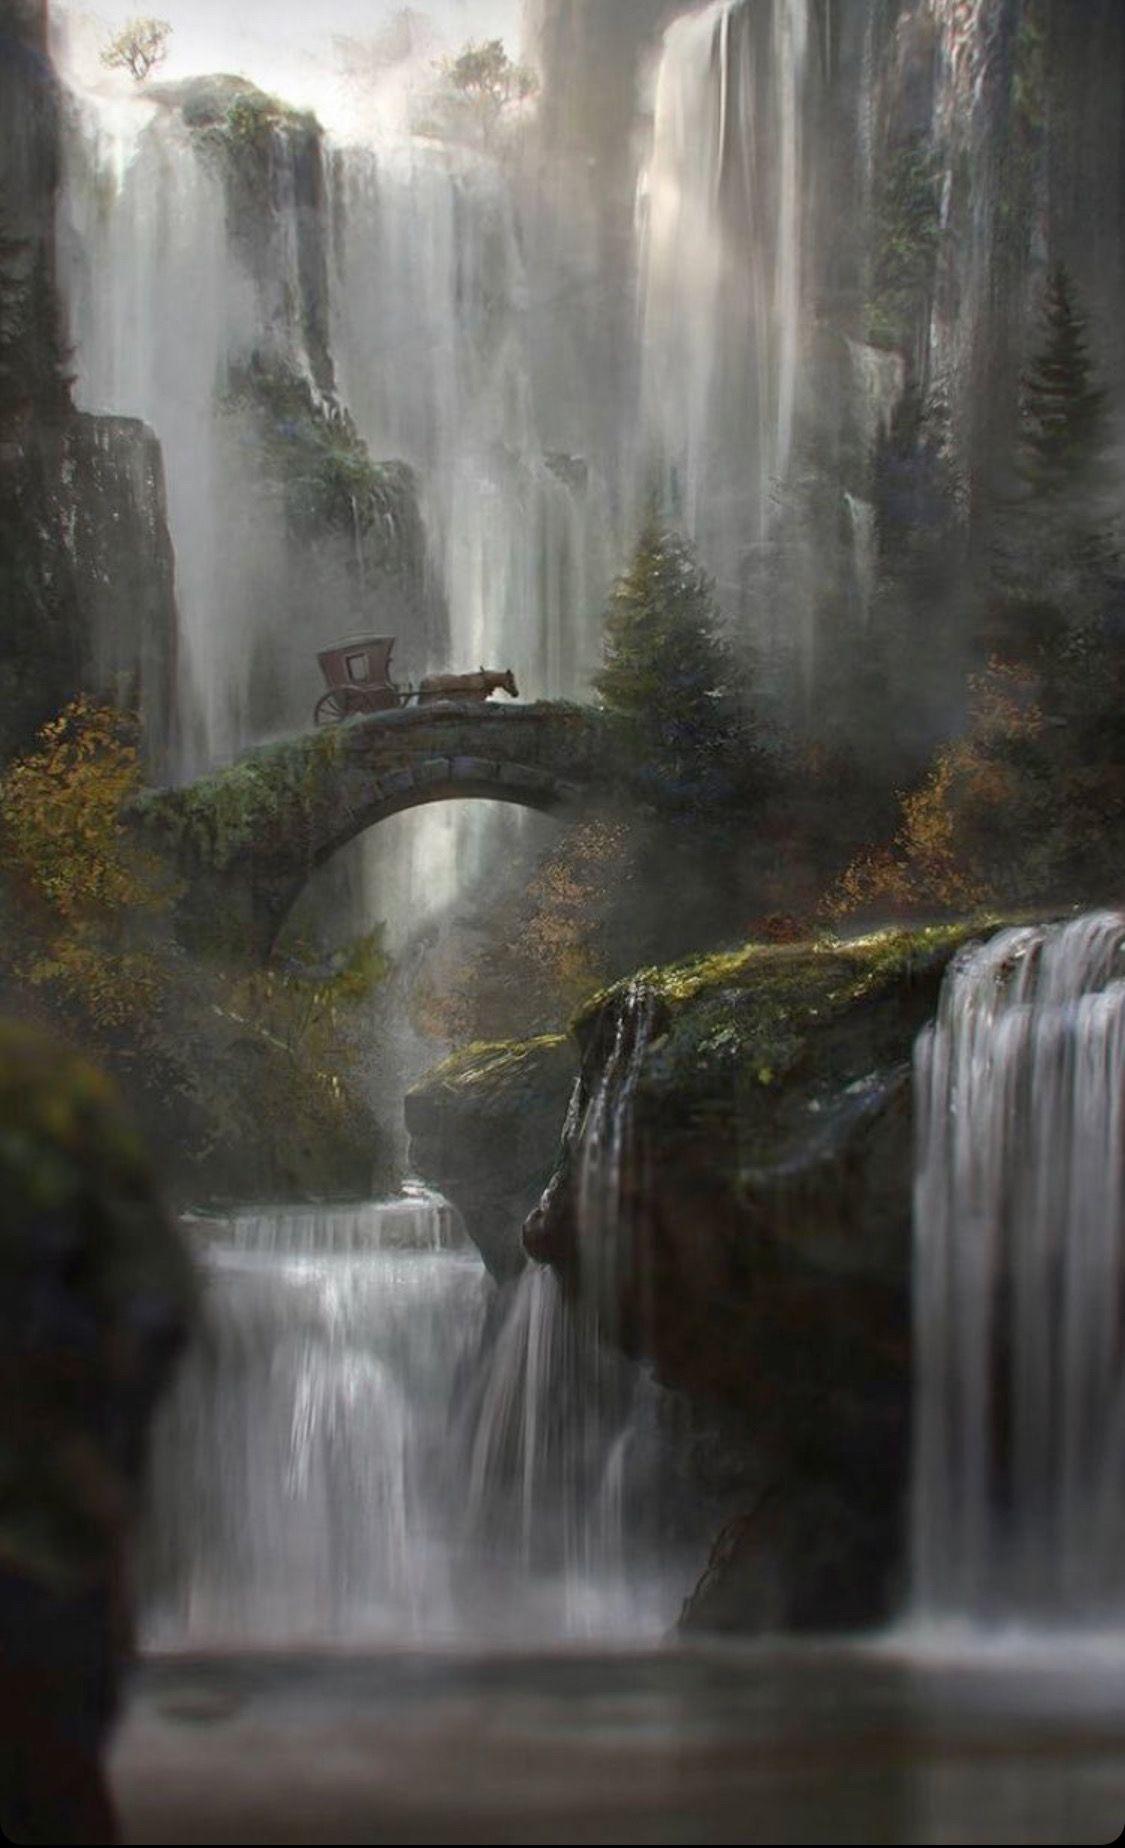 Pin by Becky Devaney on Artworks | Pinterest | Fantasy landscape ... for Fantasy Water Landscape  35fsj